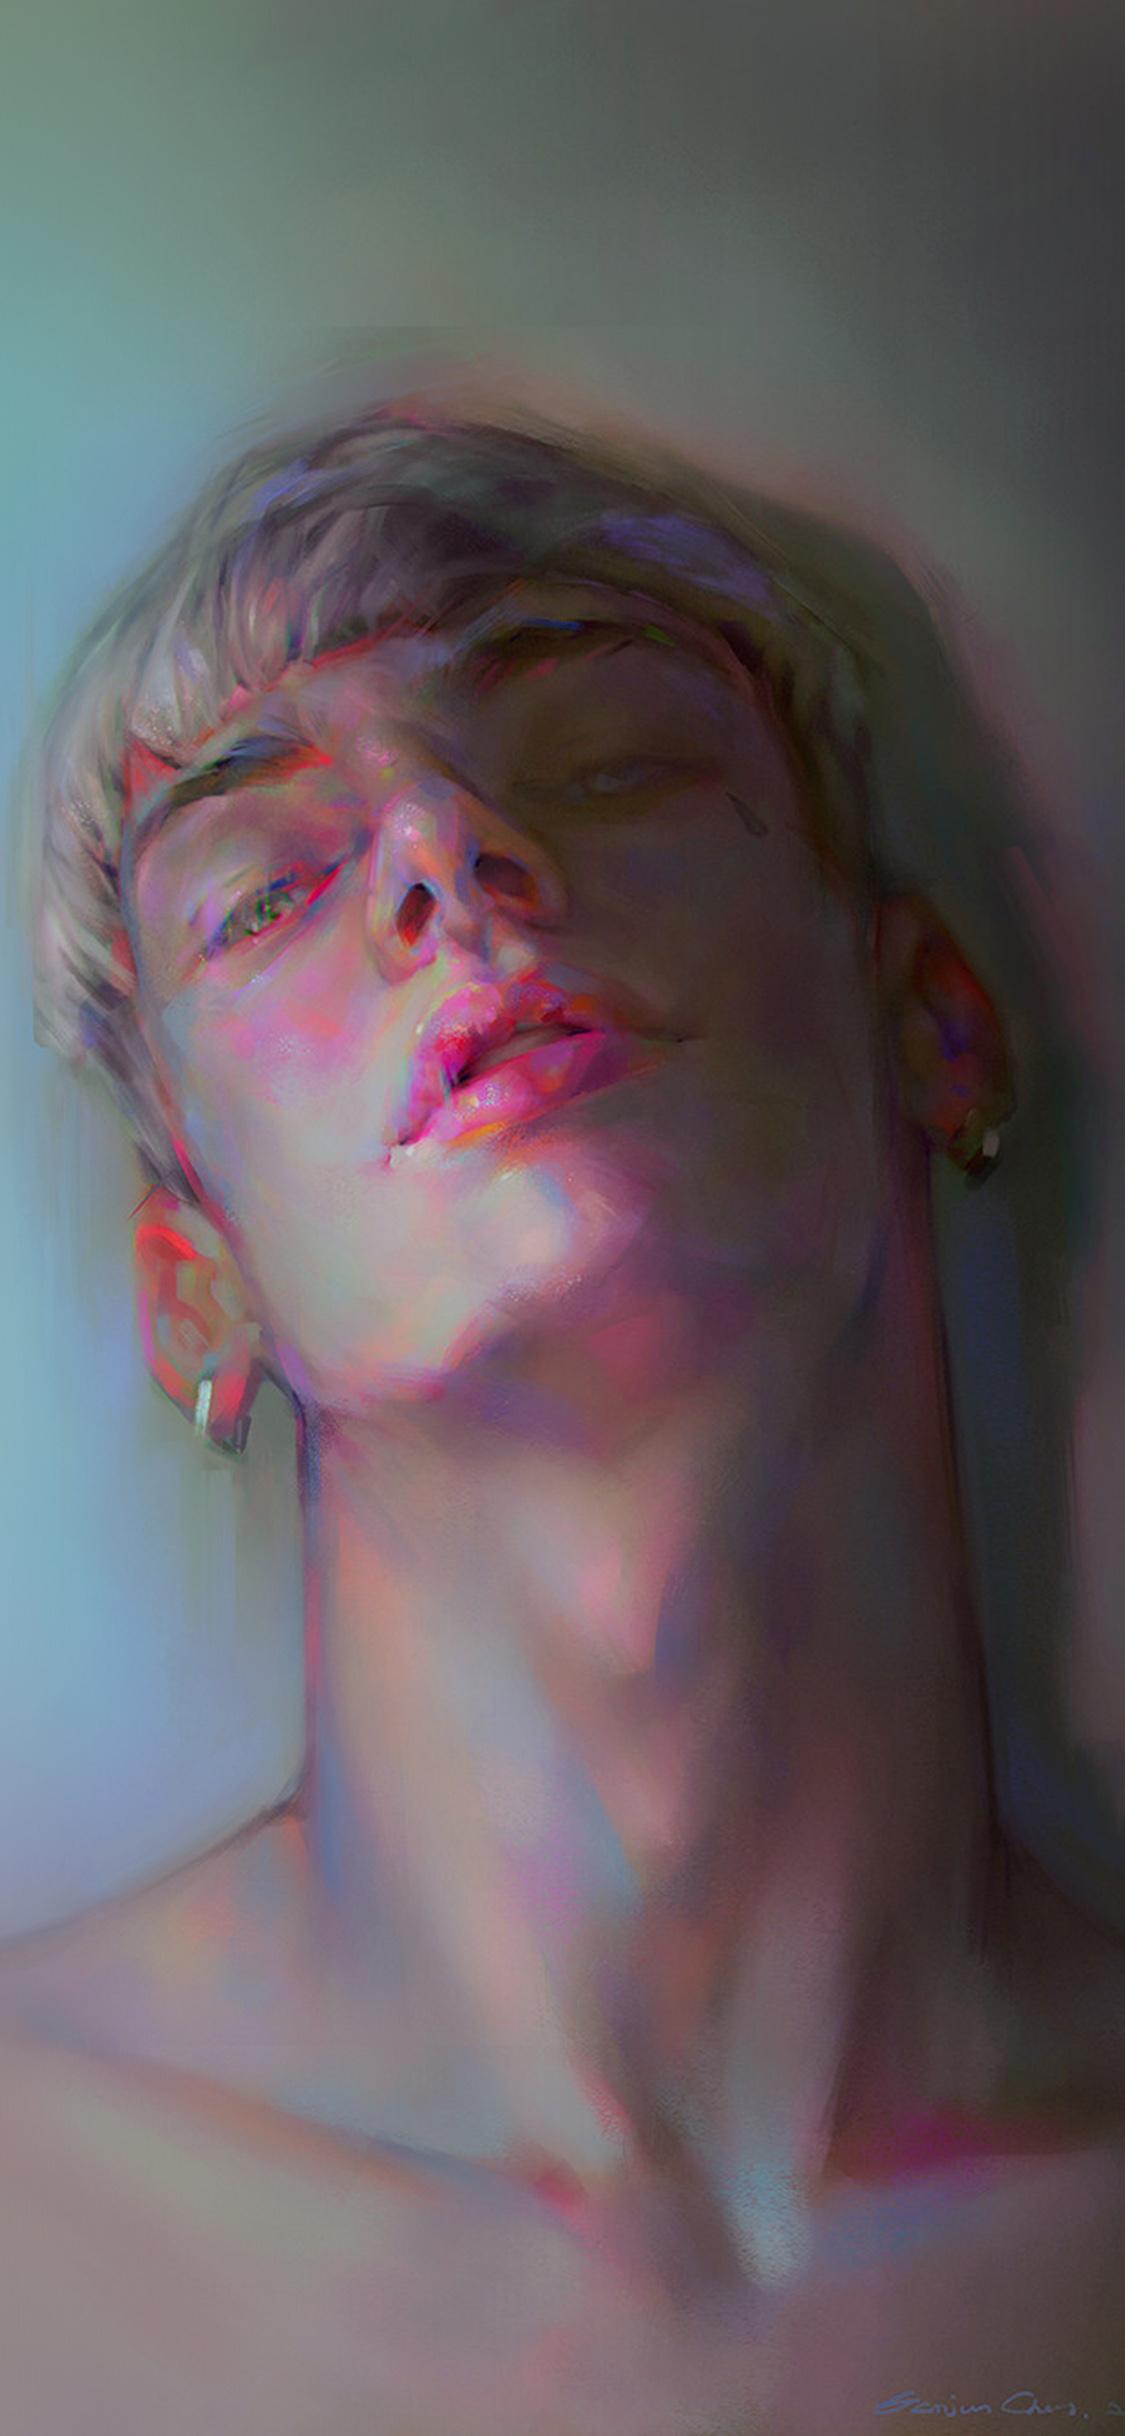 iPhoneXpapers.com-Apple-iPhone-wallpaper-ax73-yanjun-cheng-boy-dark-color-illustration-art